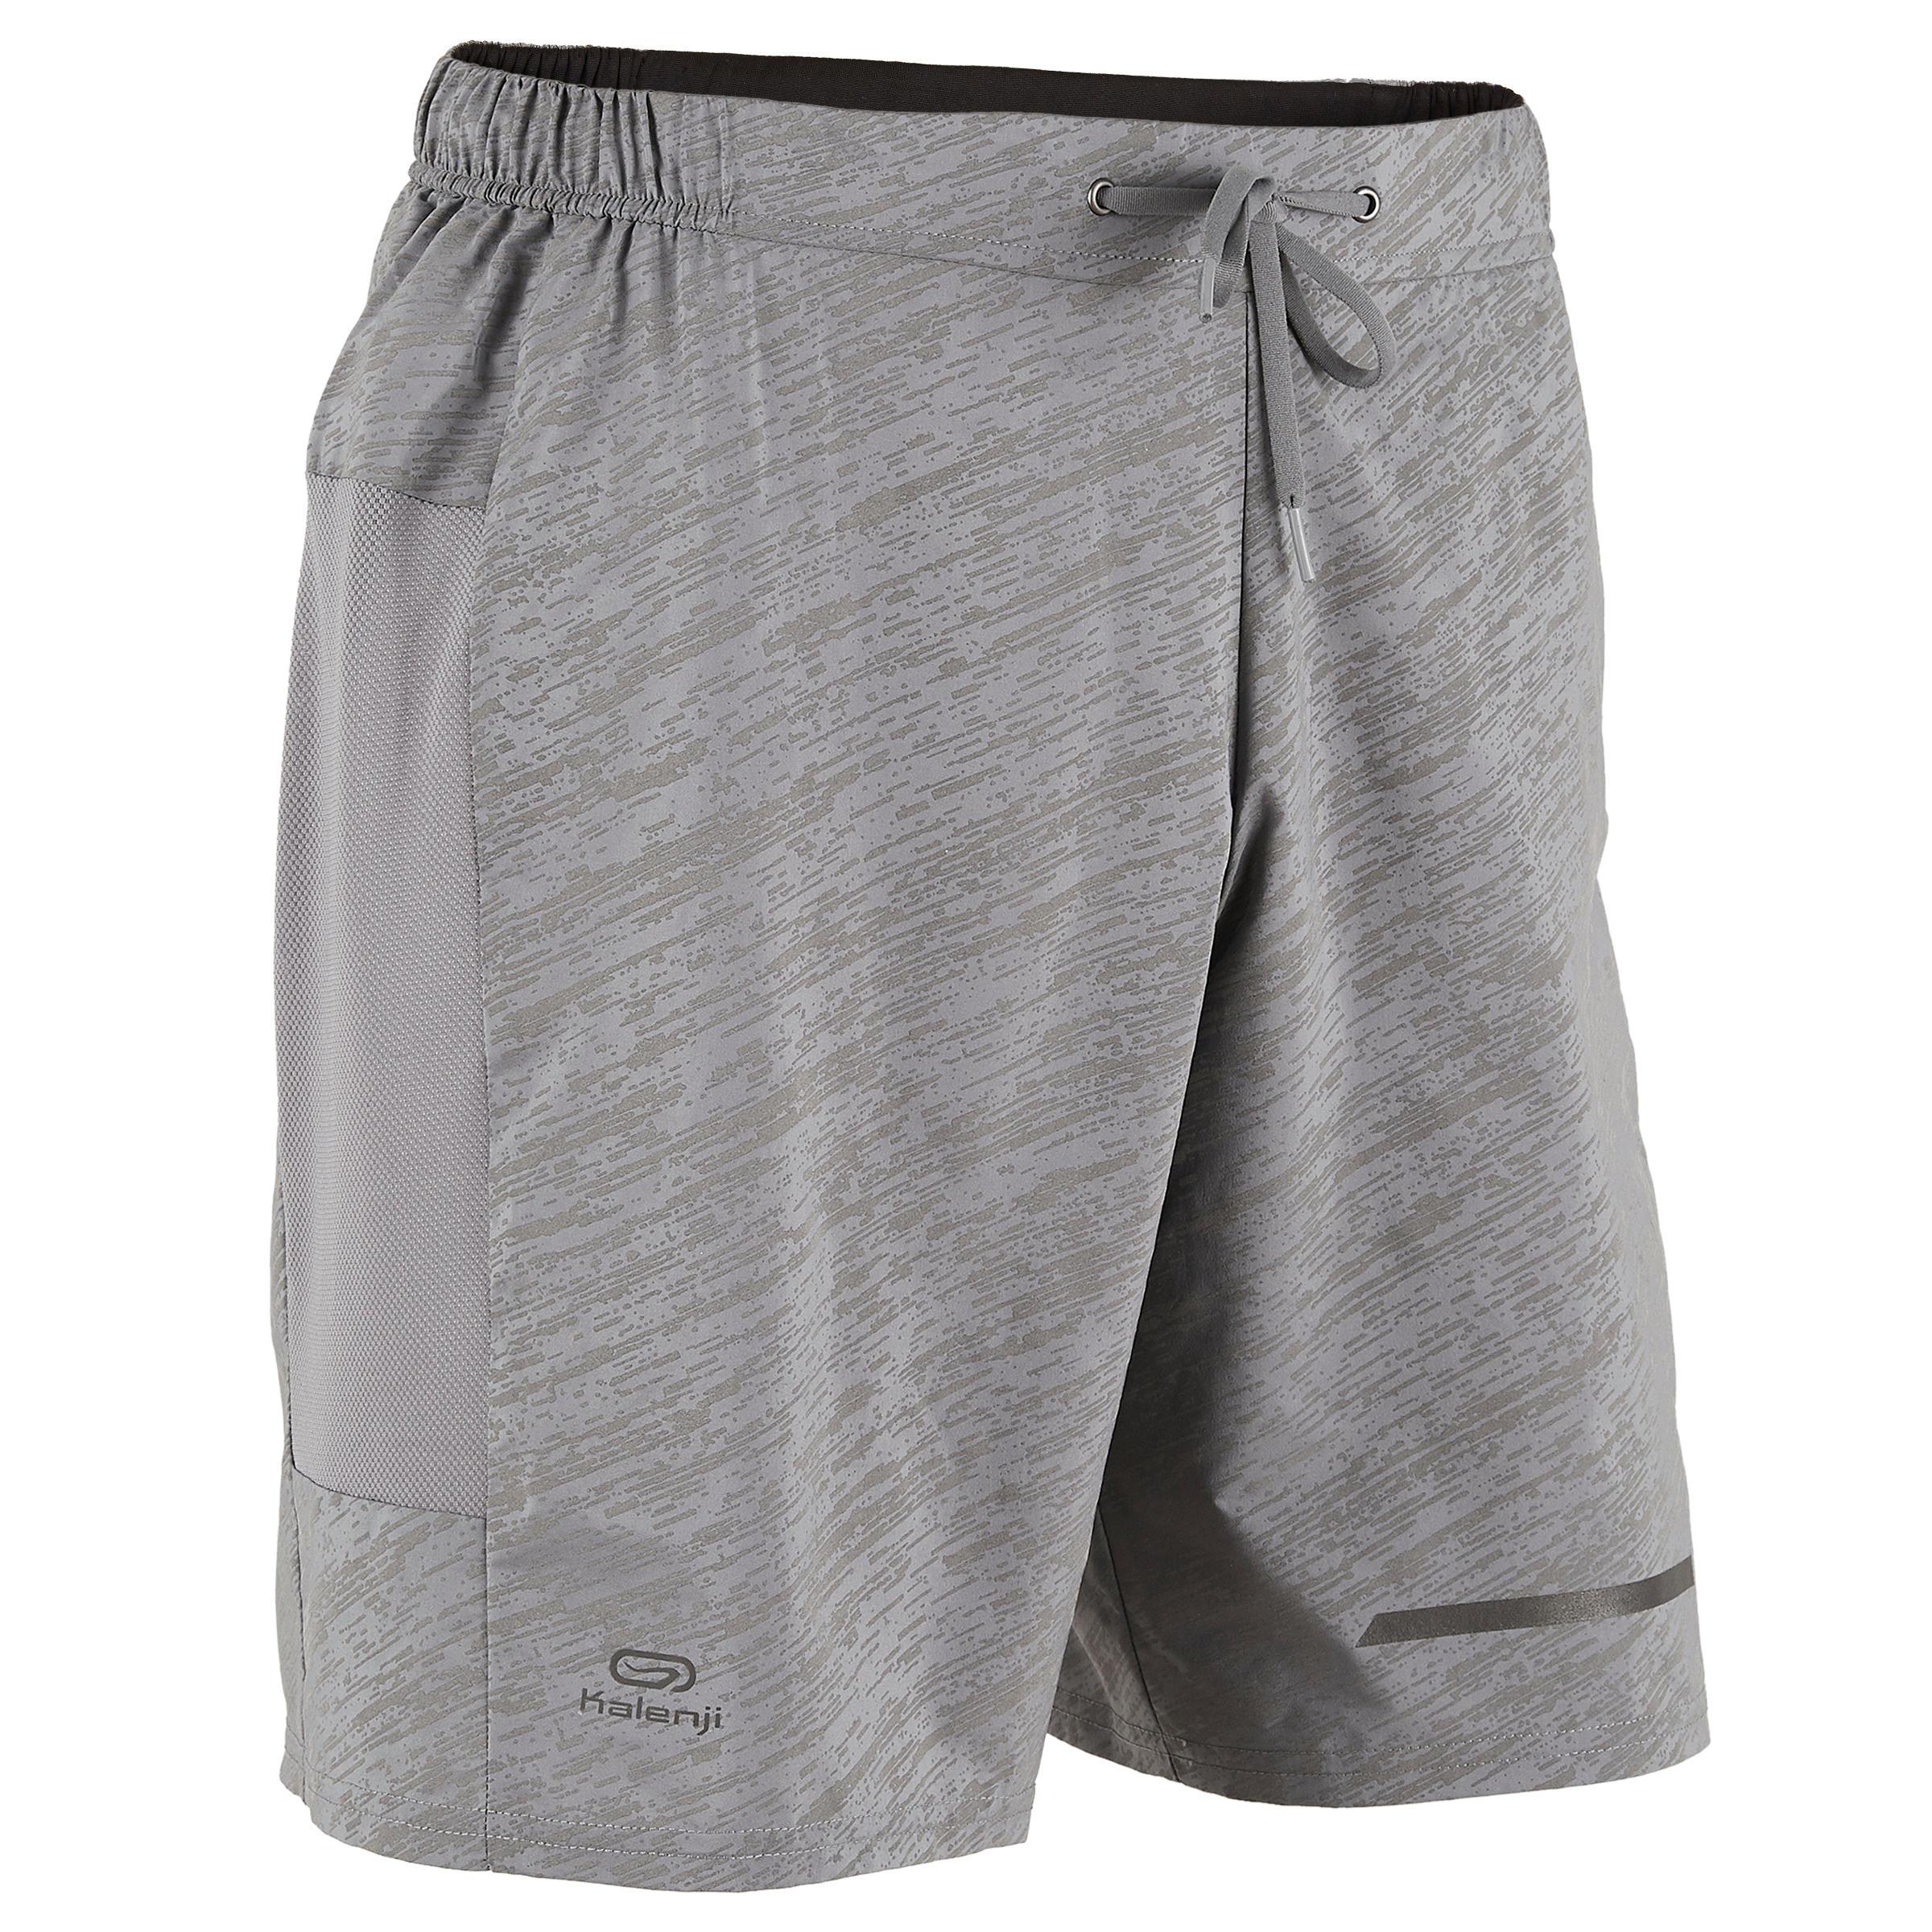 mejor lugar para envío complementario gran selección de 2019 Comprar Pantalones Running para Hombre| Decahlon